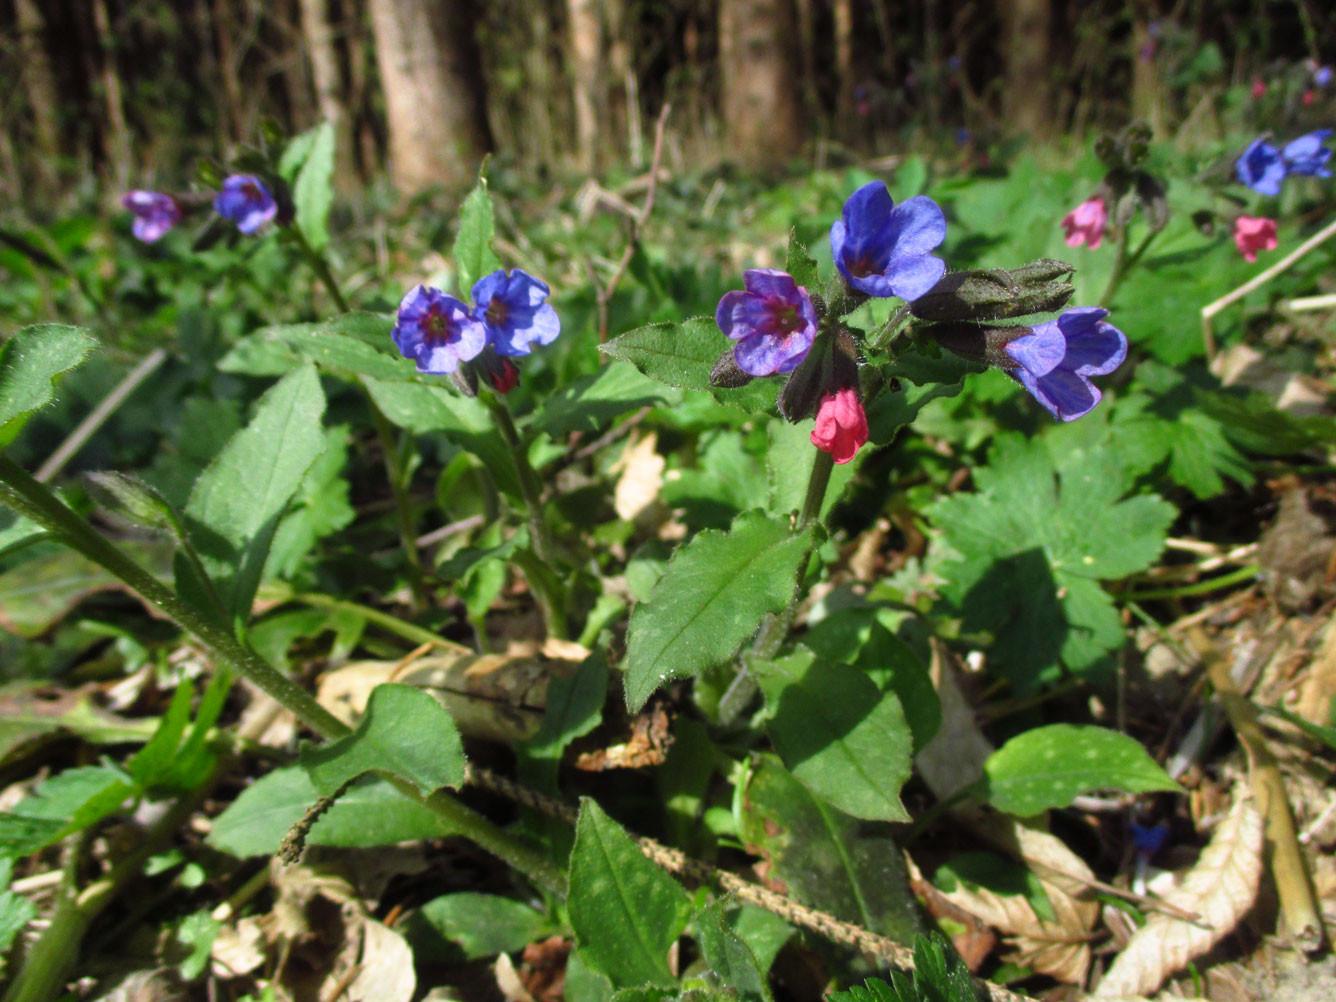 Echtes Lungenkraut (Pulmonaria officinalis) | Familie: Raublattgewächse (Boraginaceae)